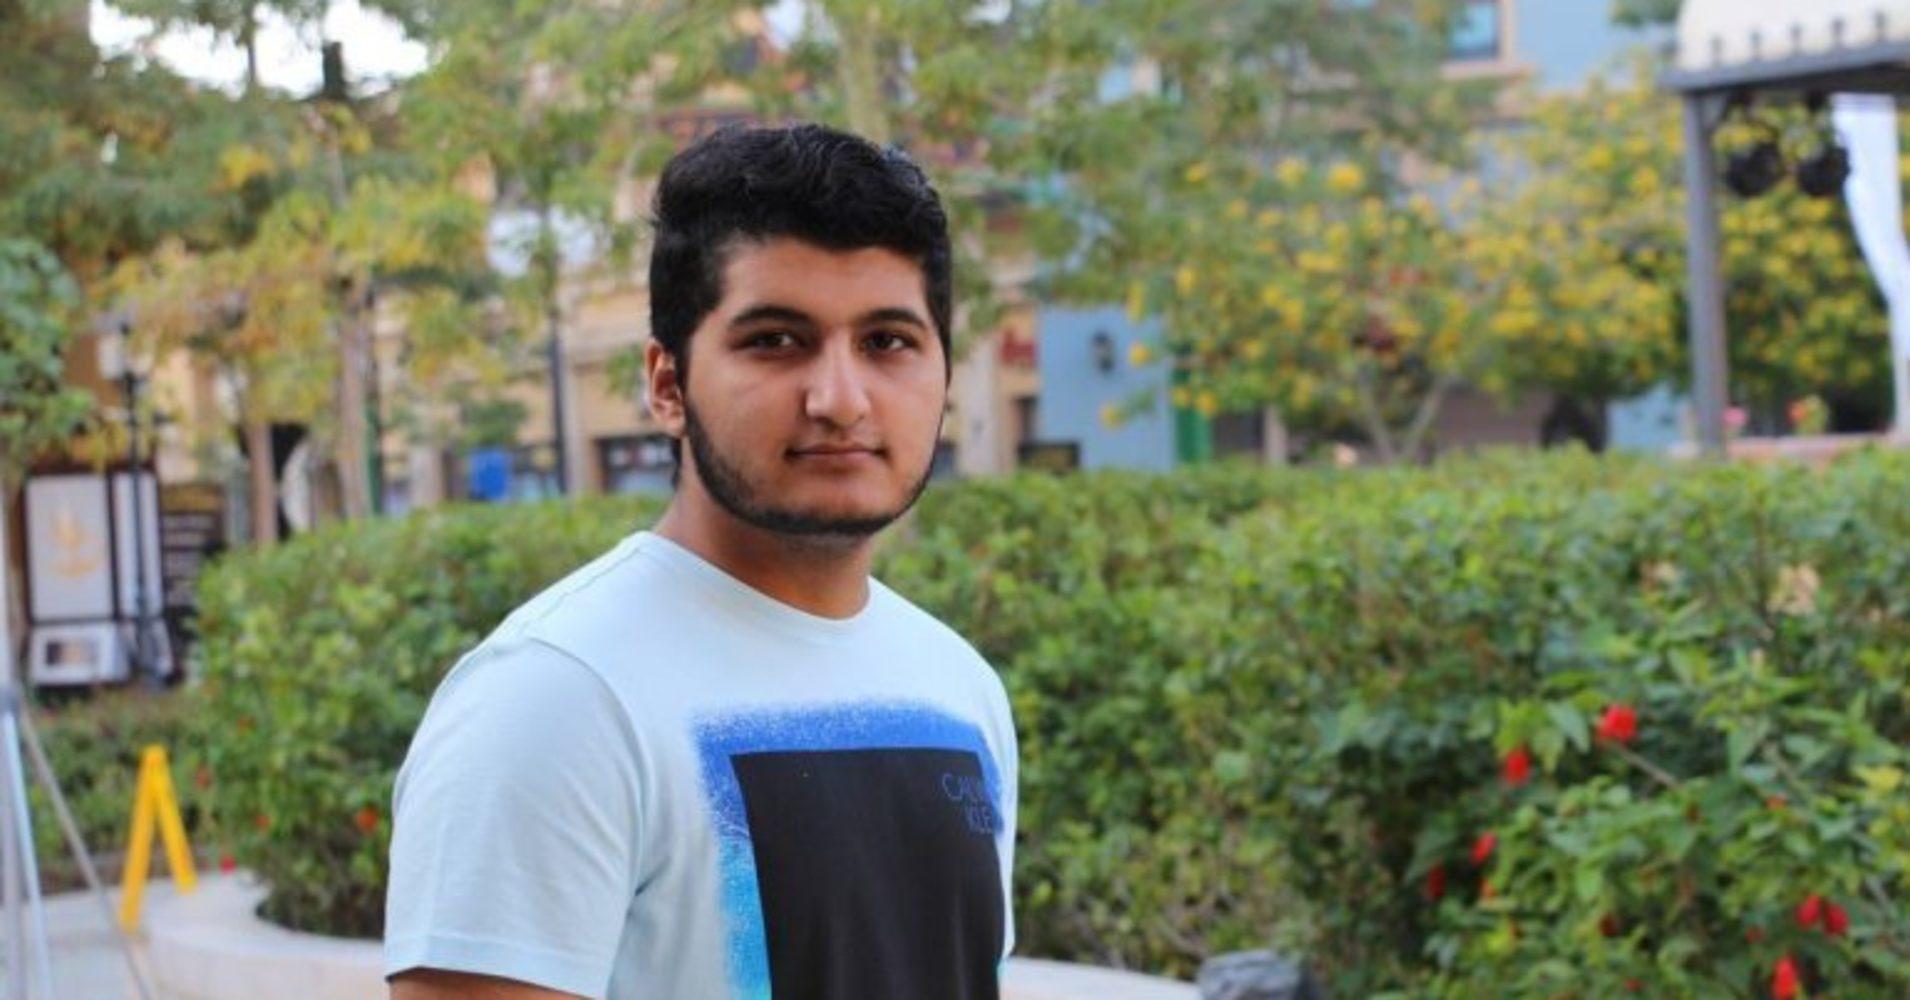 Muaaz Shakeel Shares His Secrets to MASSIVE YouTube Growth